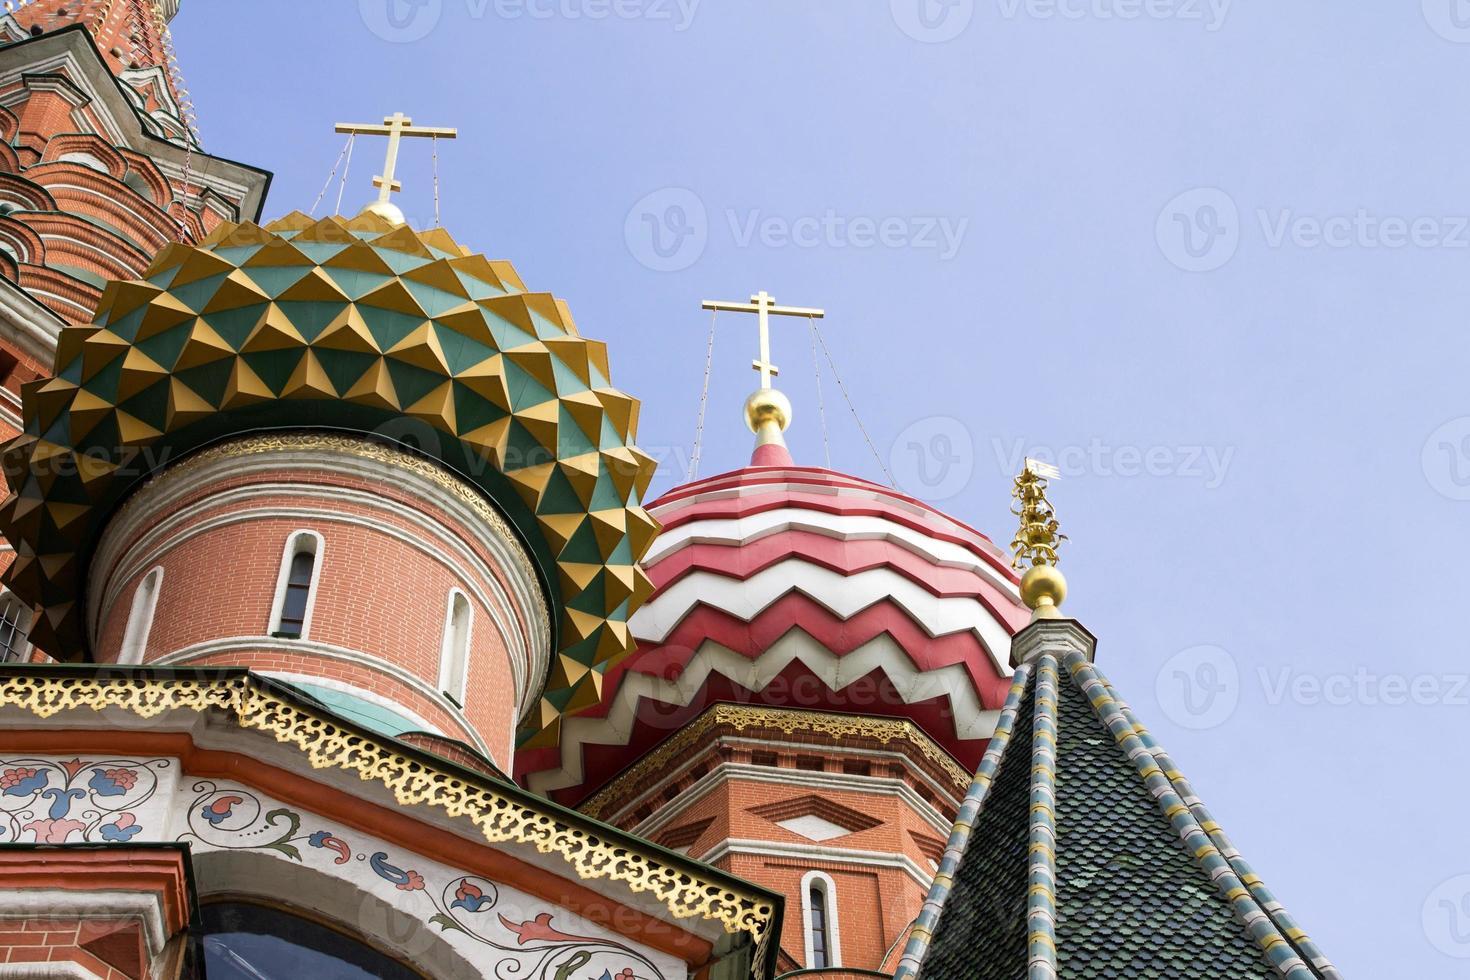 st basils kathedraal op het Rode plein in Moskou, Rusland foto